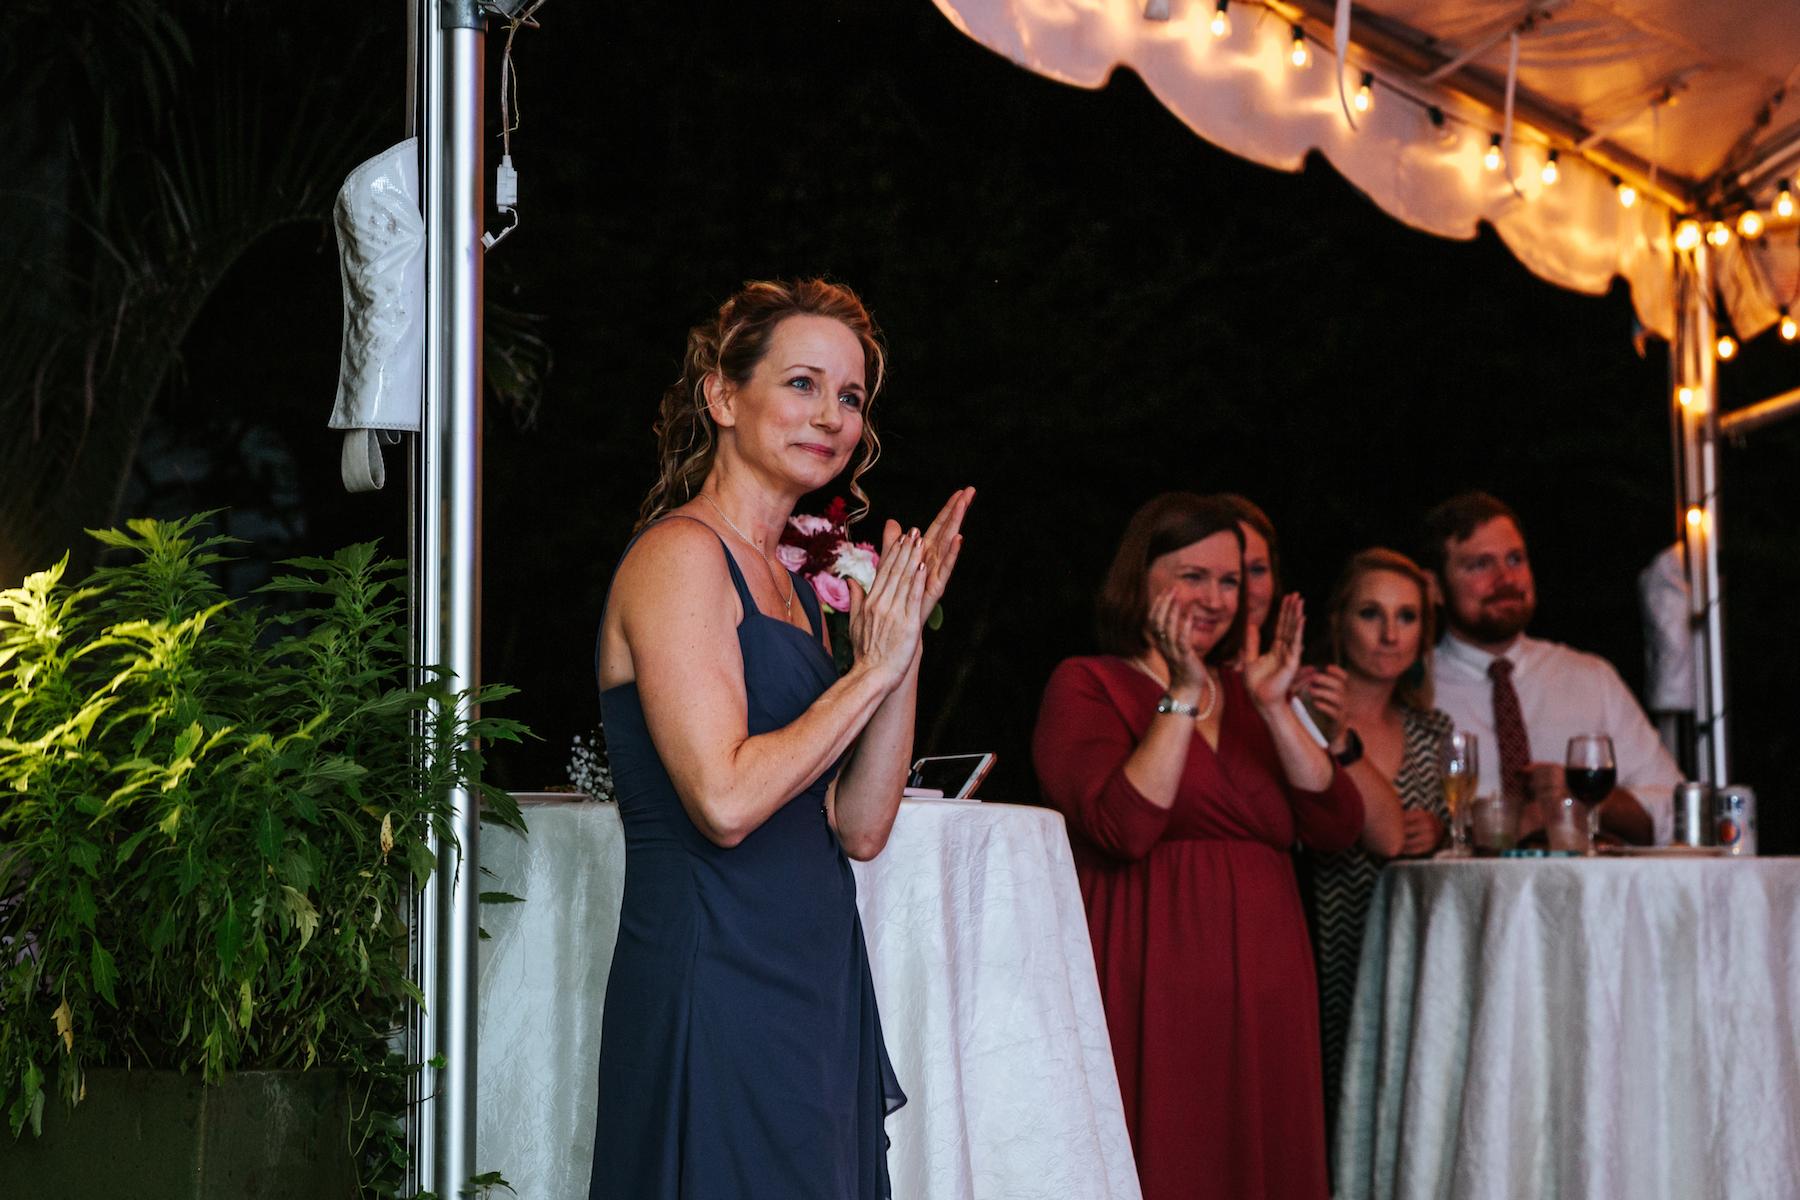 South-Carolina-Wedding-Engagement-Bridal-Photographer-Columbia-Greenville-Spartanburg-763.JPG